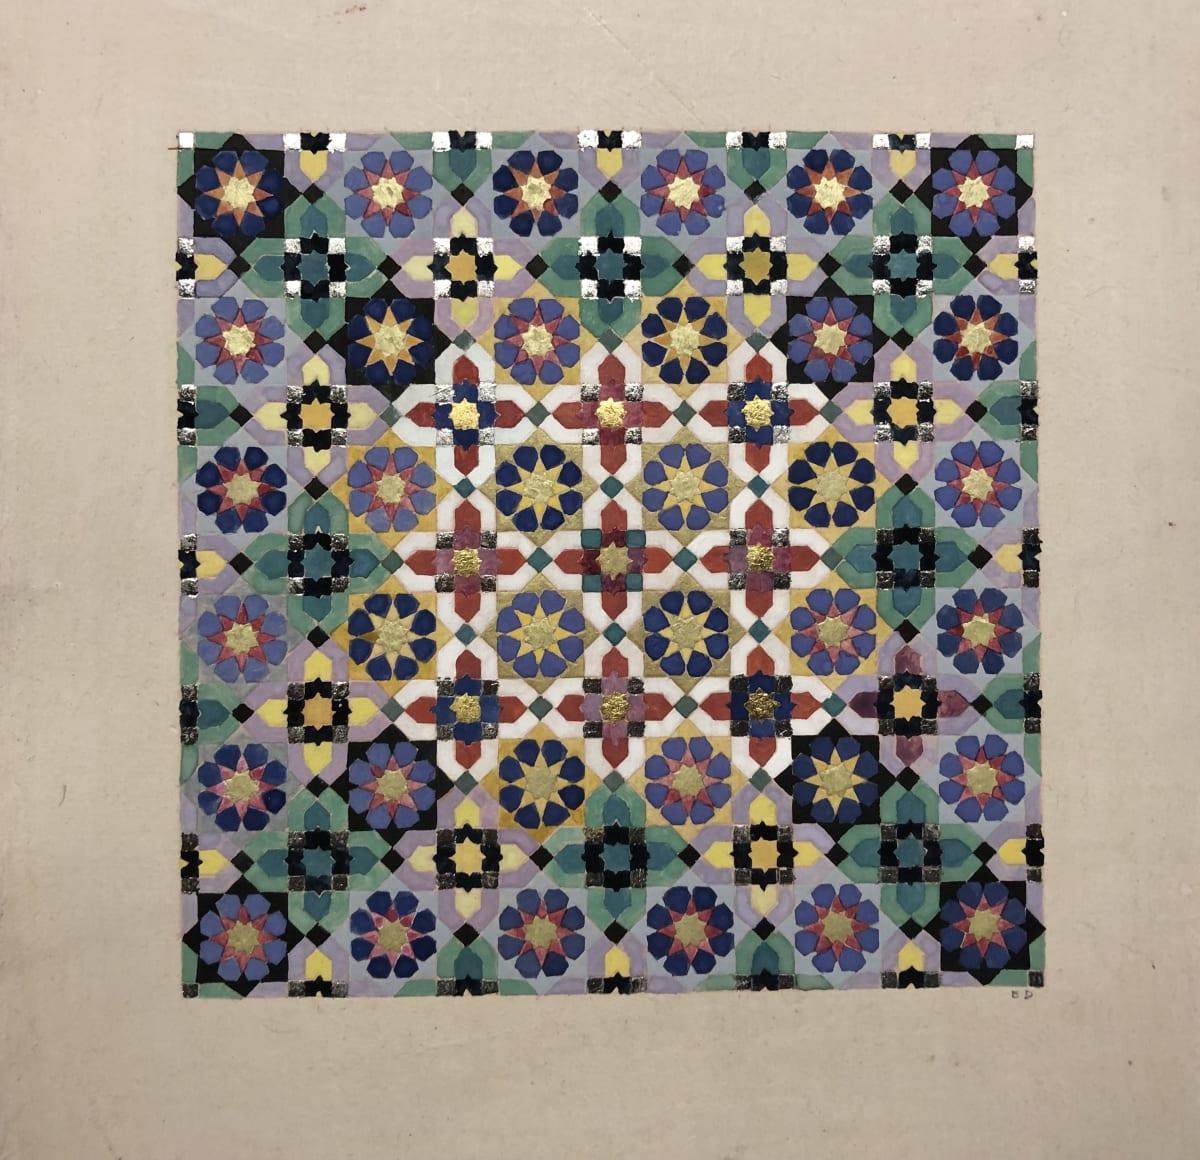 Elisabeth Deane b. 1985Untitled, 2020 Italian gold leaf, platinum leaf, natural pigments and Arabic gum on handmade Indian hemp paper 32 x 21.5 cm 12 5/8 x 8 1/2 in